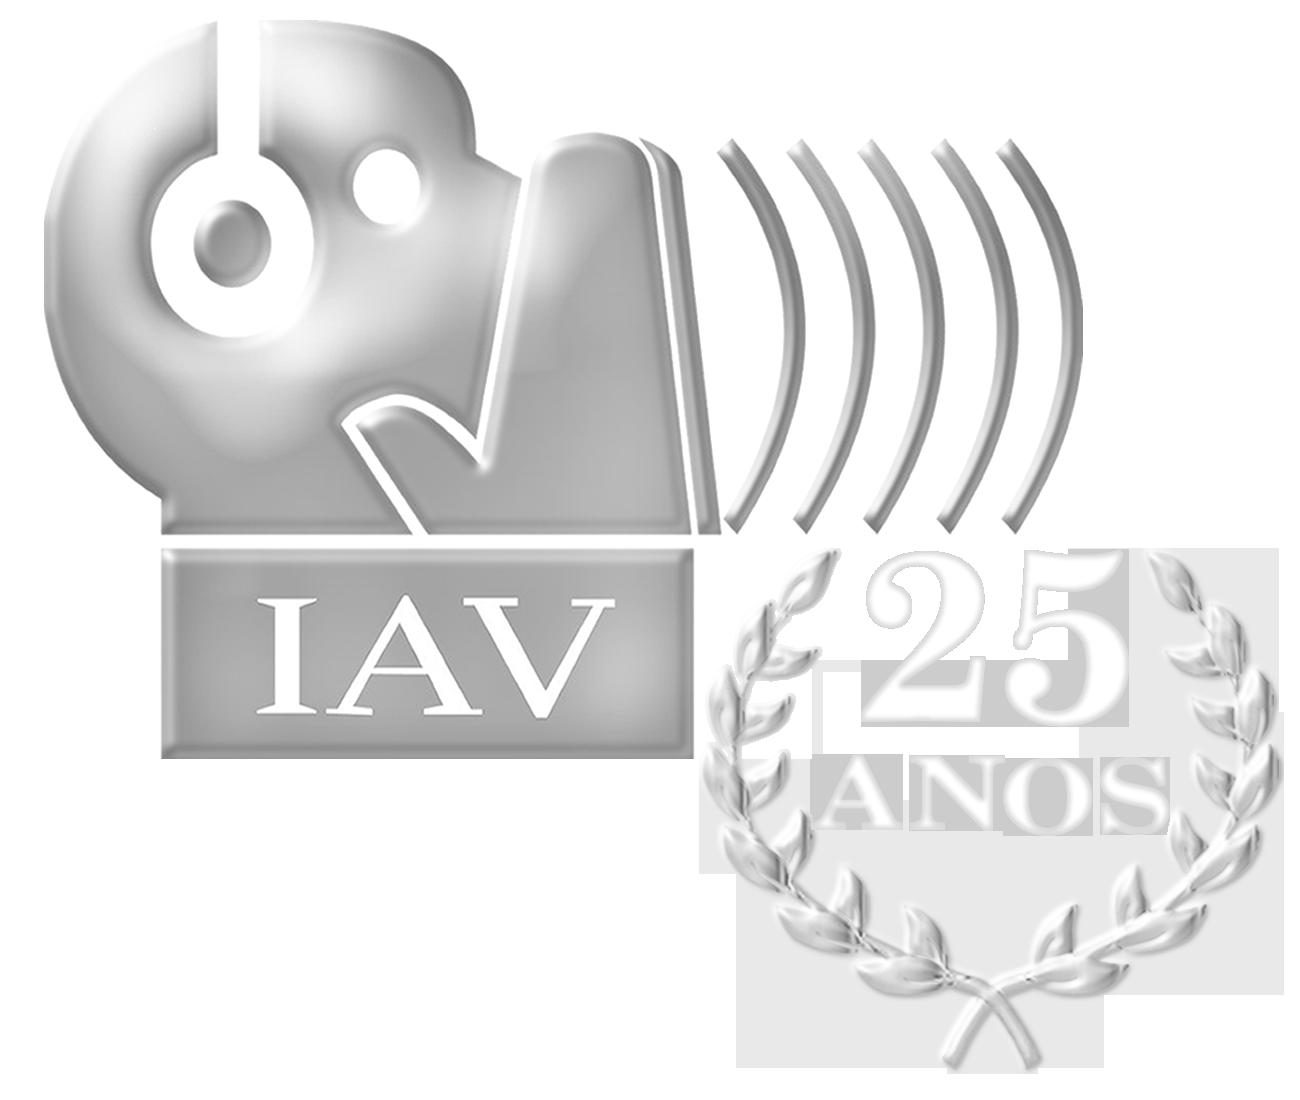 Logo IAV - Instituto de Cinema